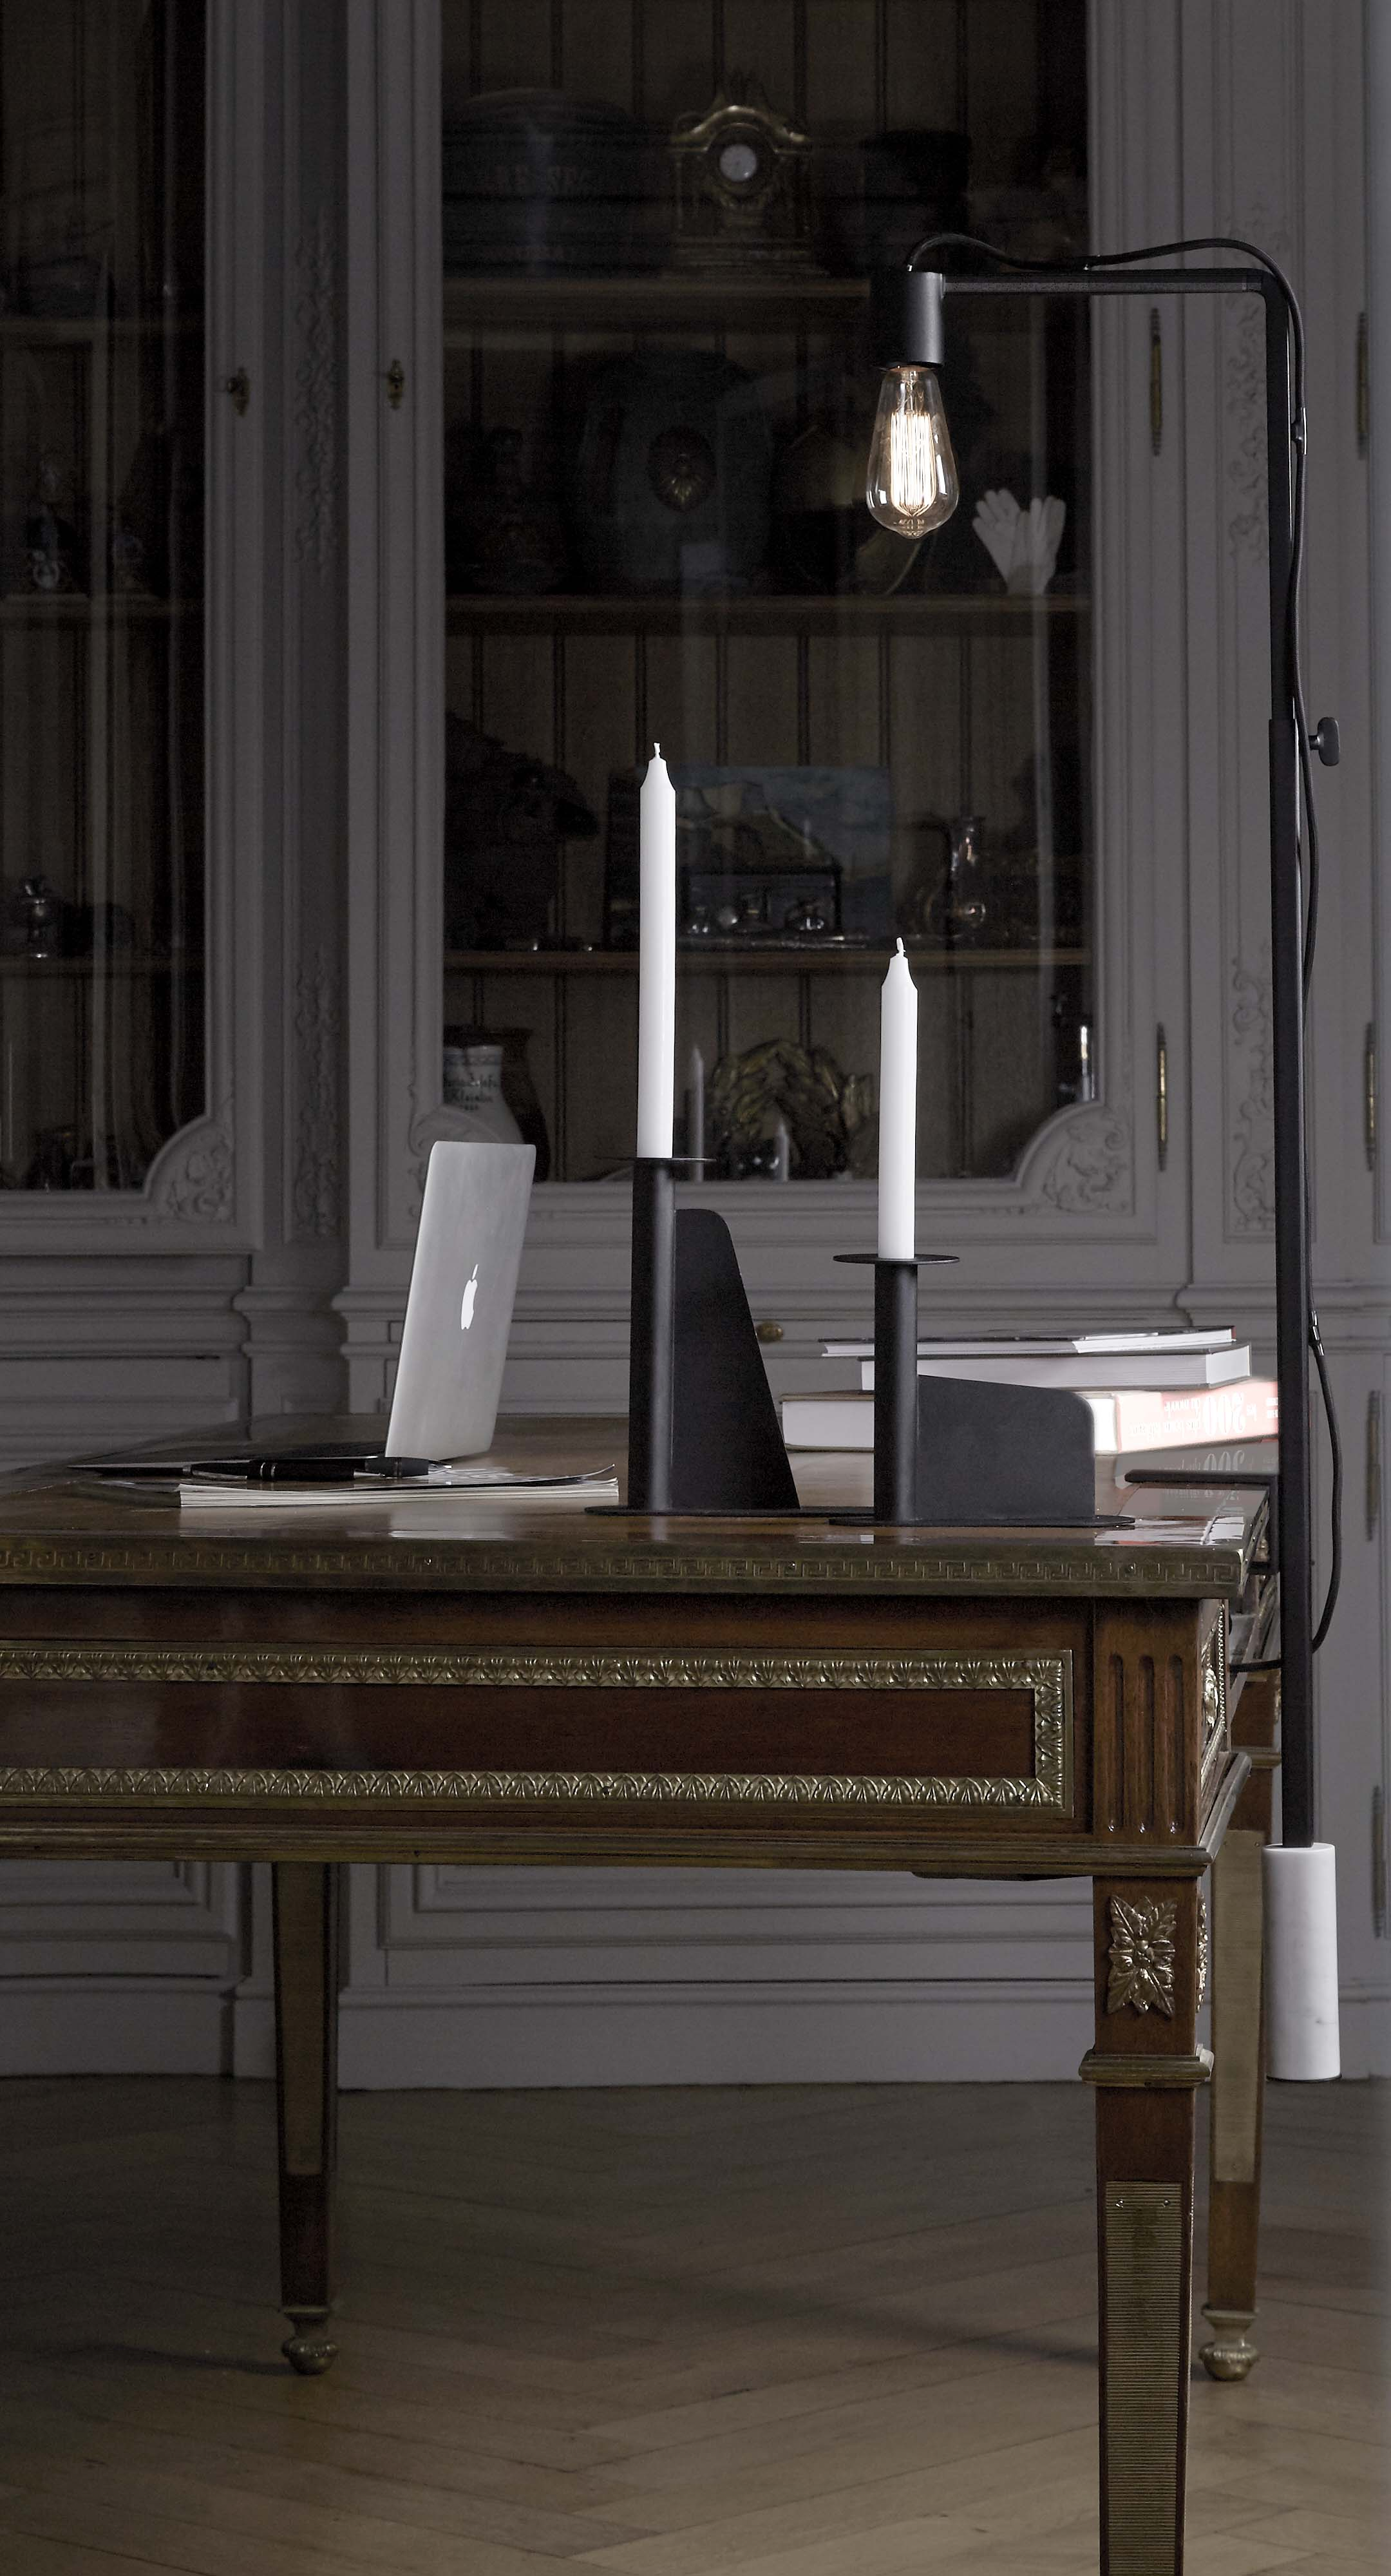 Launch RADAR new ItalianFrench brand of interior design objects